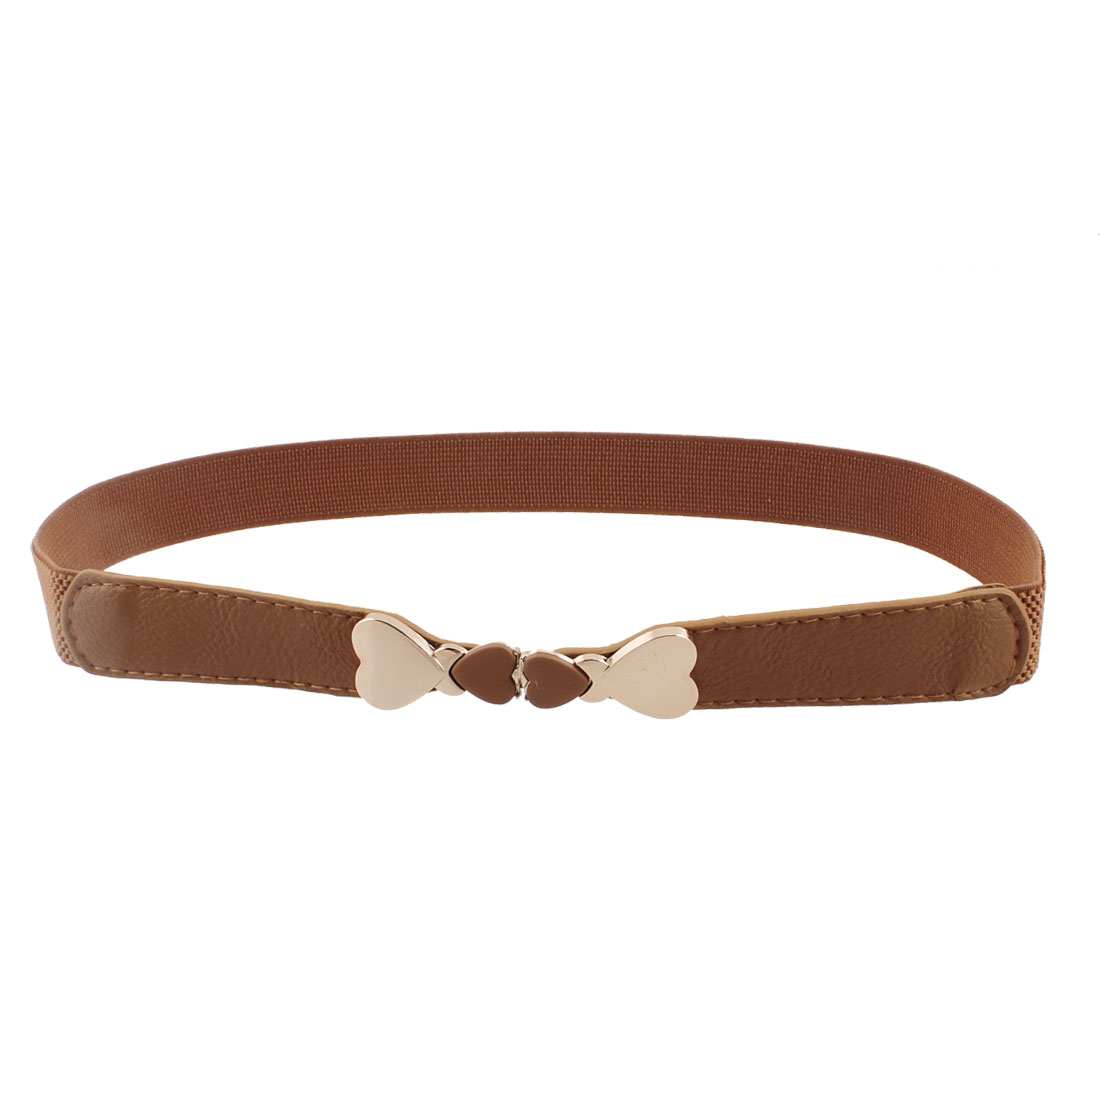 Heart Detail Interlocking Buckle Elastic Brown Waist Belt Waistband Corset Band for Ladies